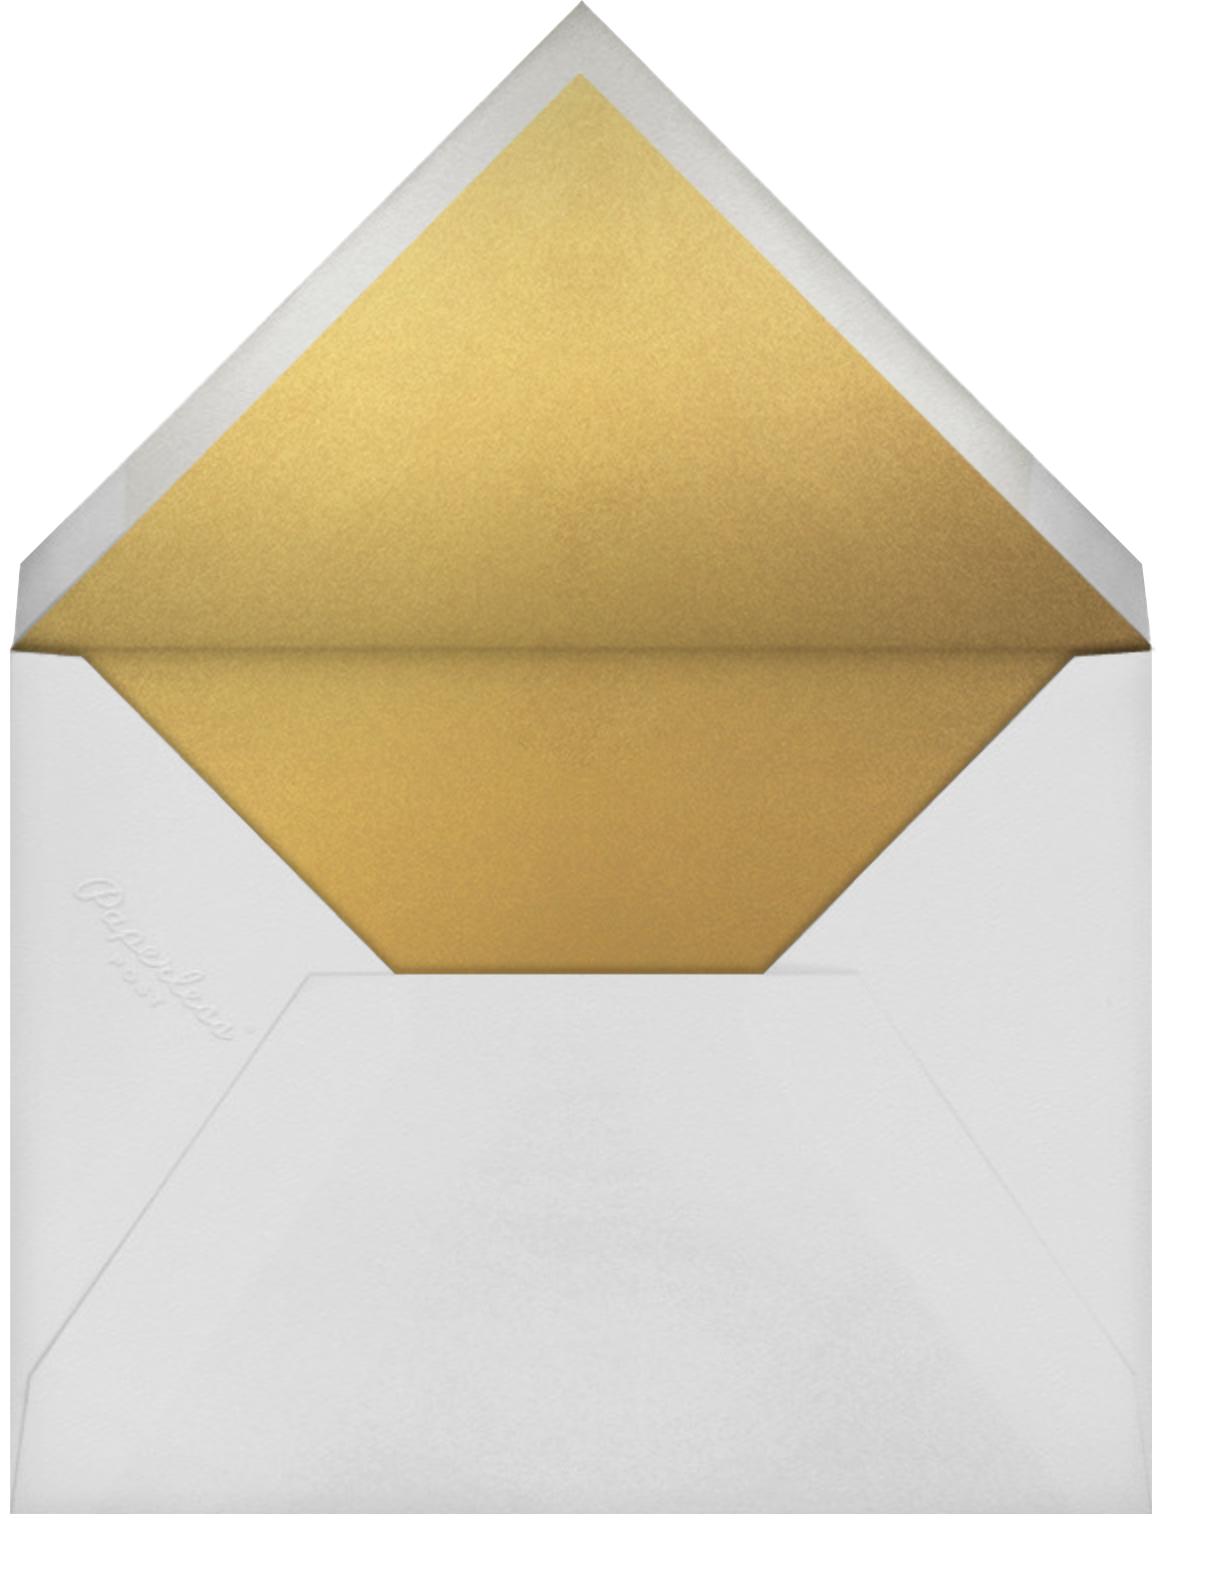 Firth - Amethyst - Vera Wang - All - envelope back